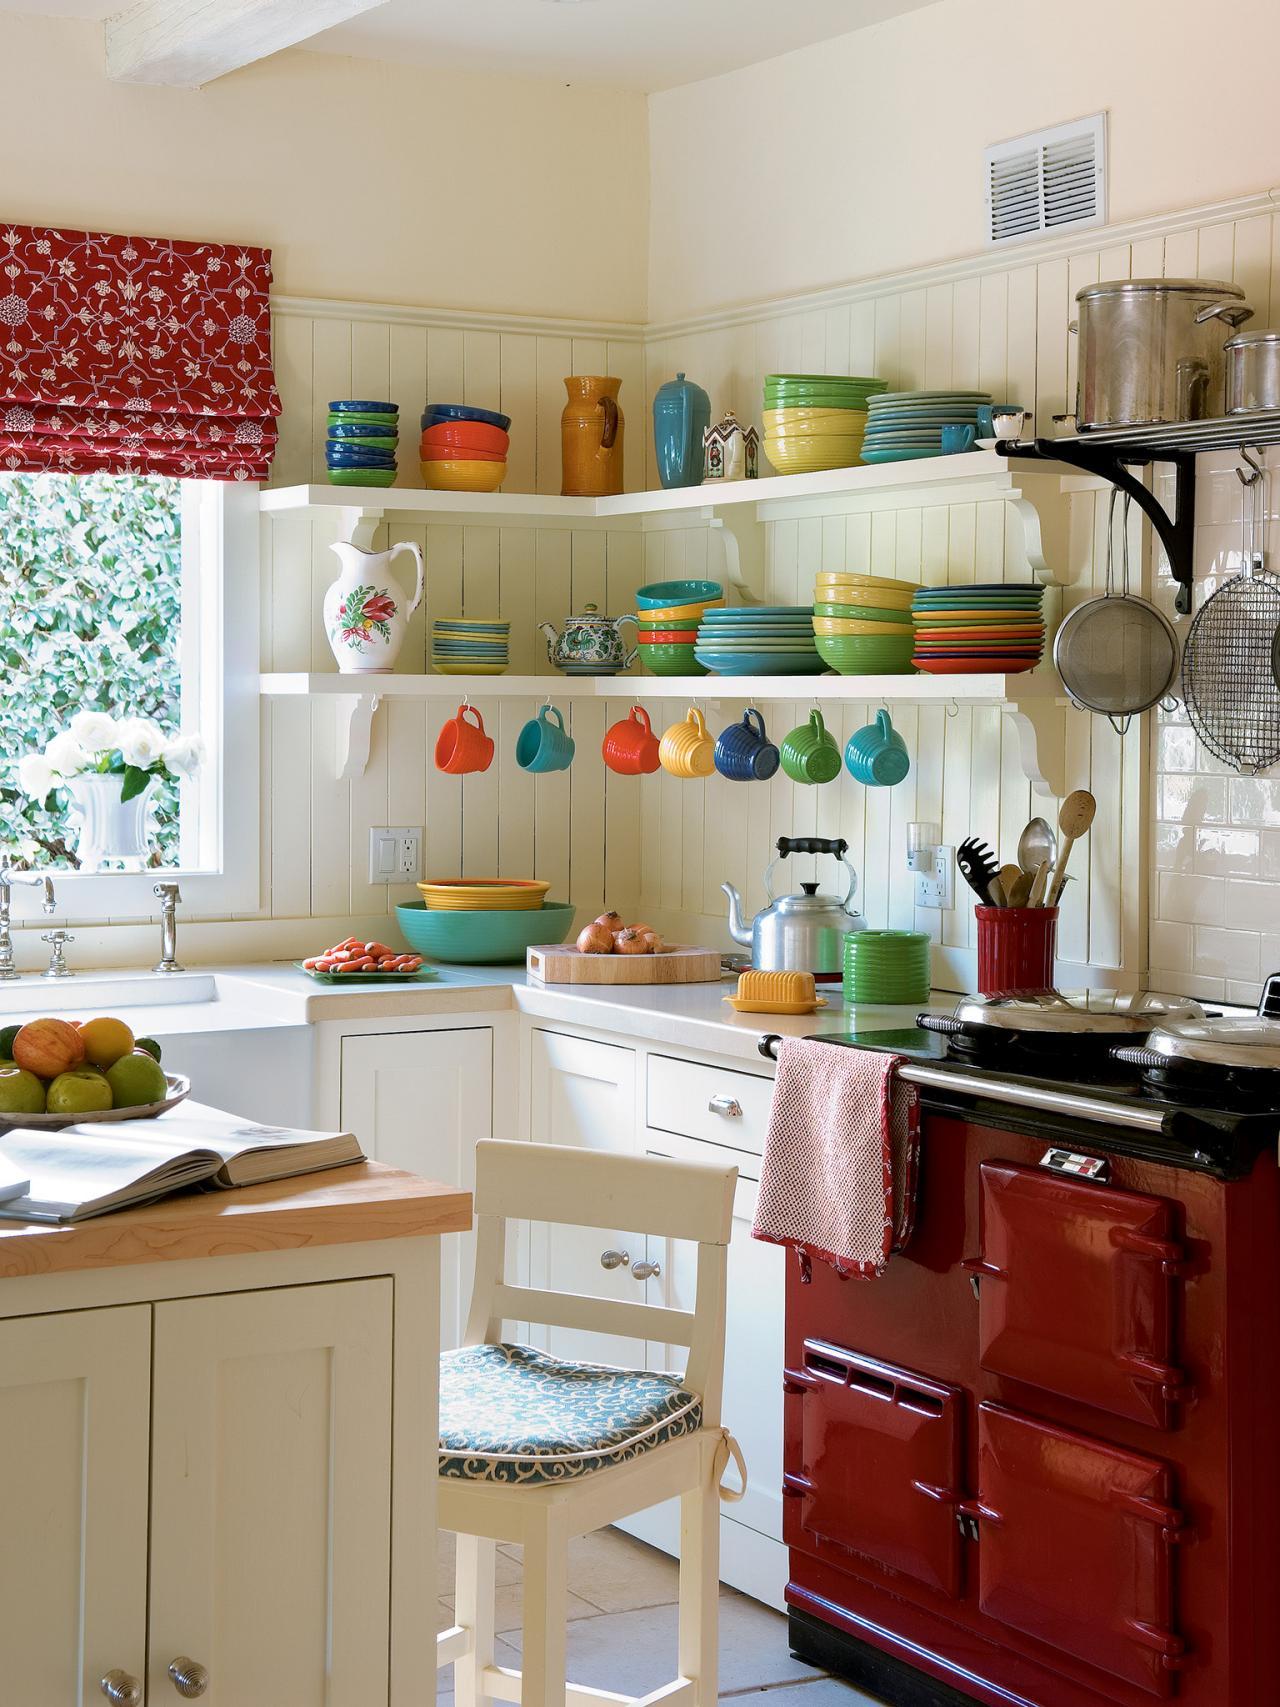 31 Creative Small Kitchen Design Ideas on Small Kitchen Remodel Ideas  id=70894